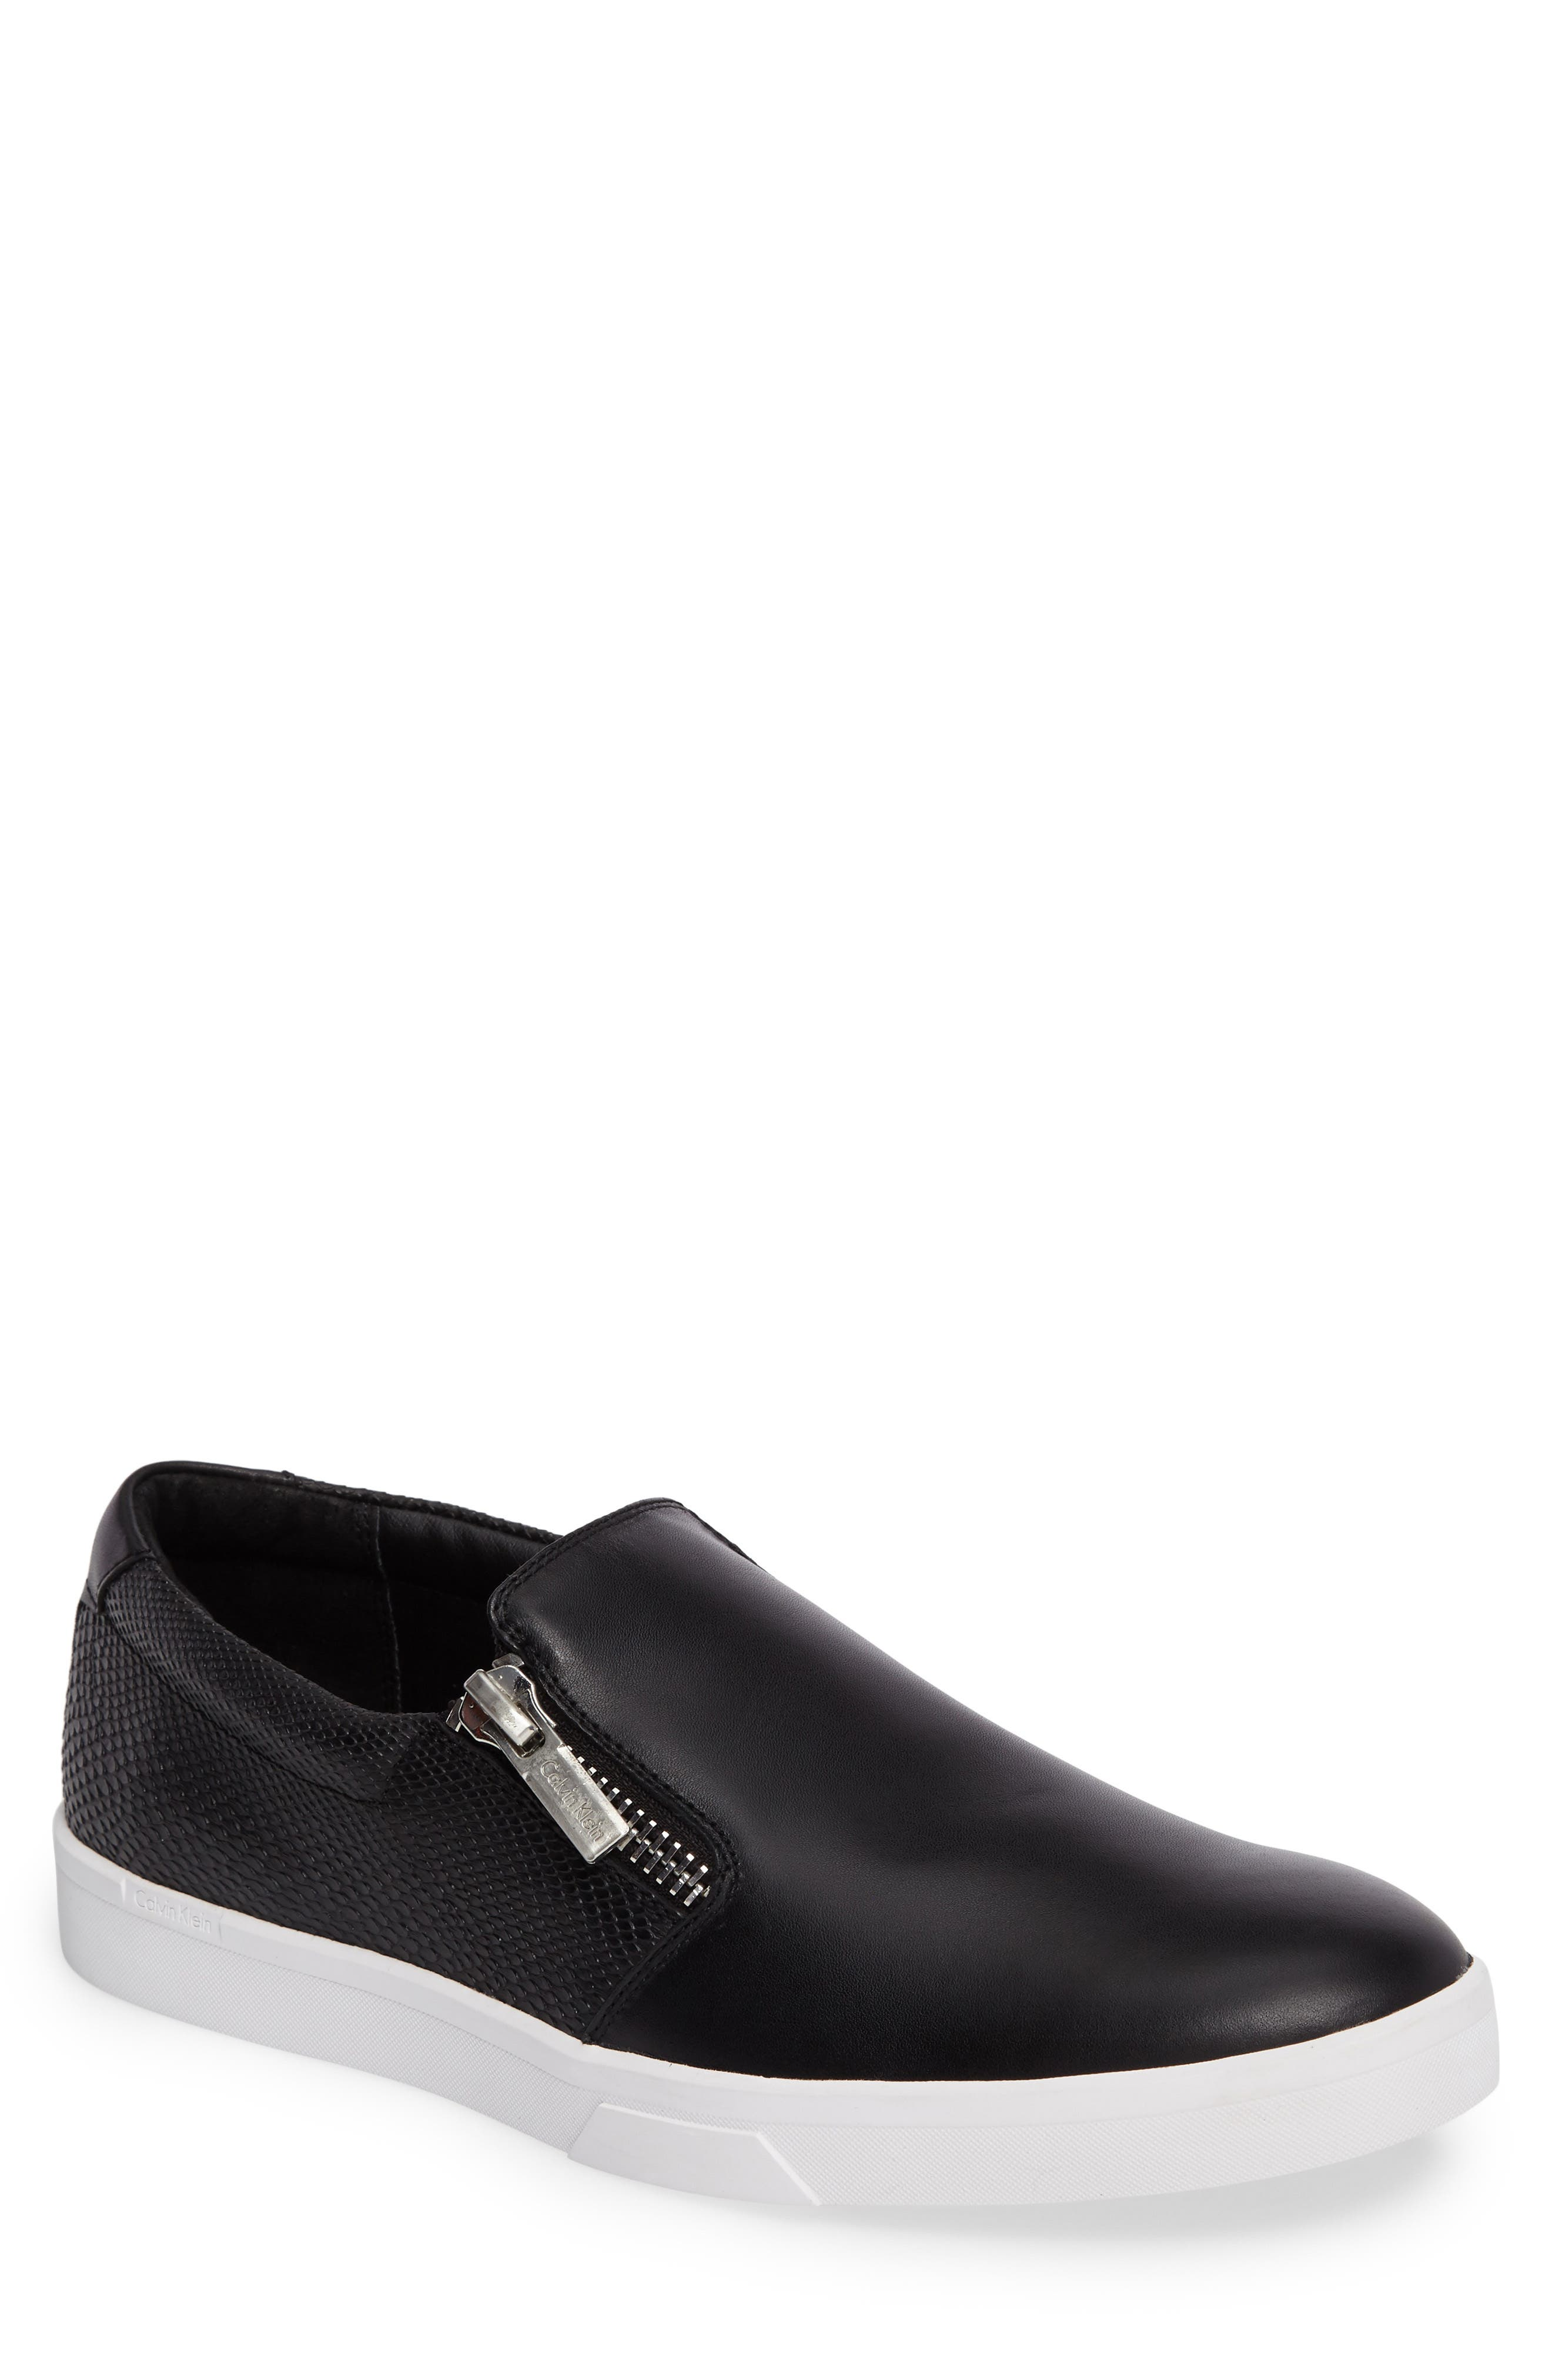 Ibiza Slip-On Zip Sneaker,                         Main,                         color, Black Leather